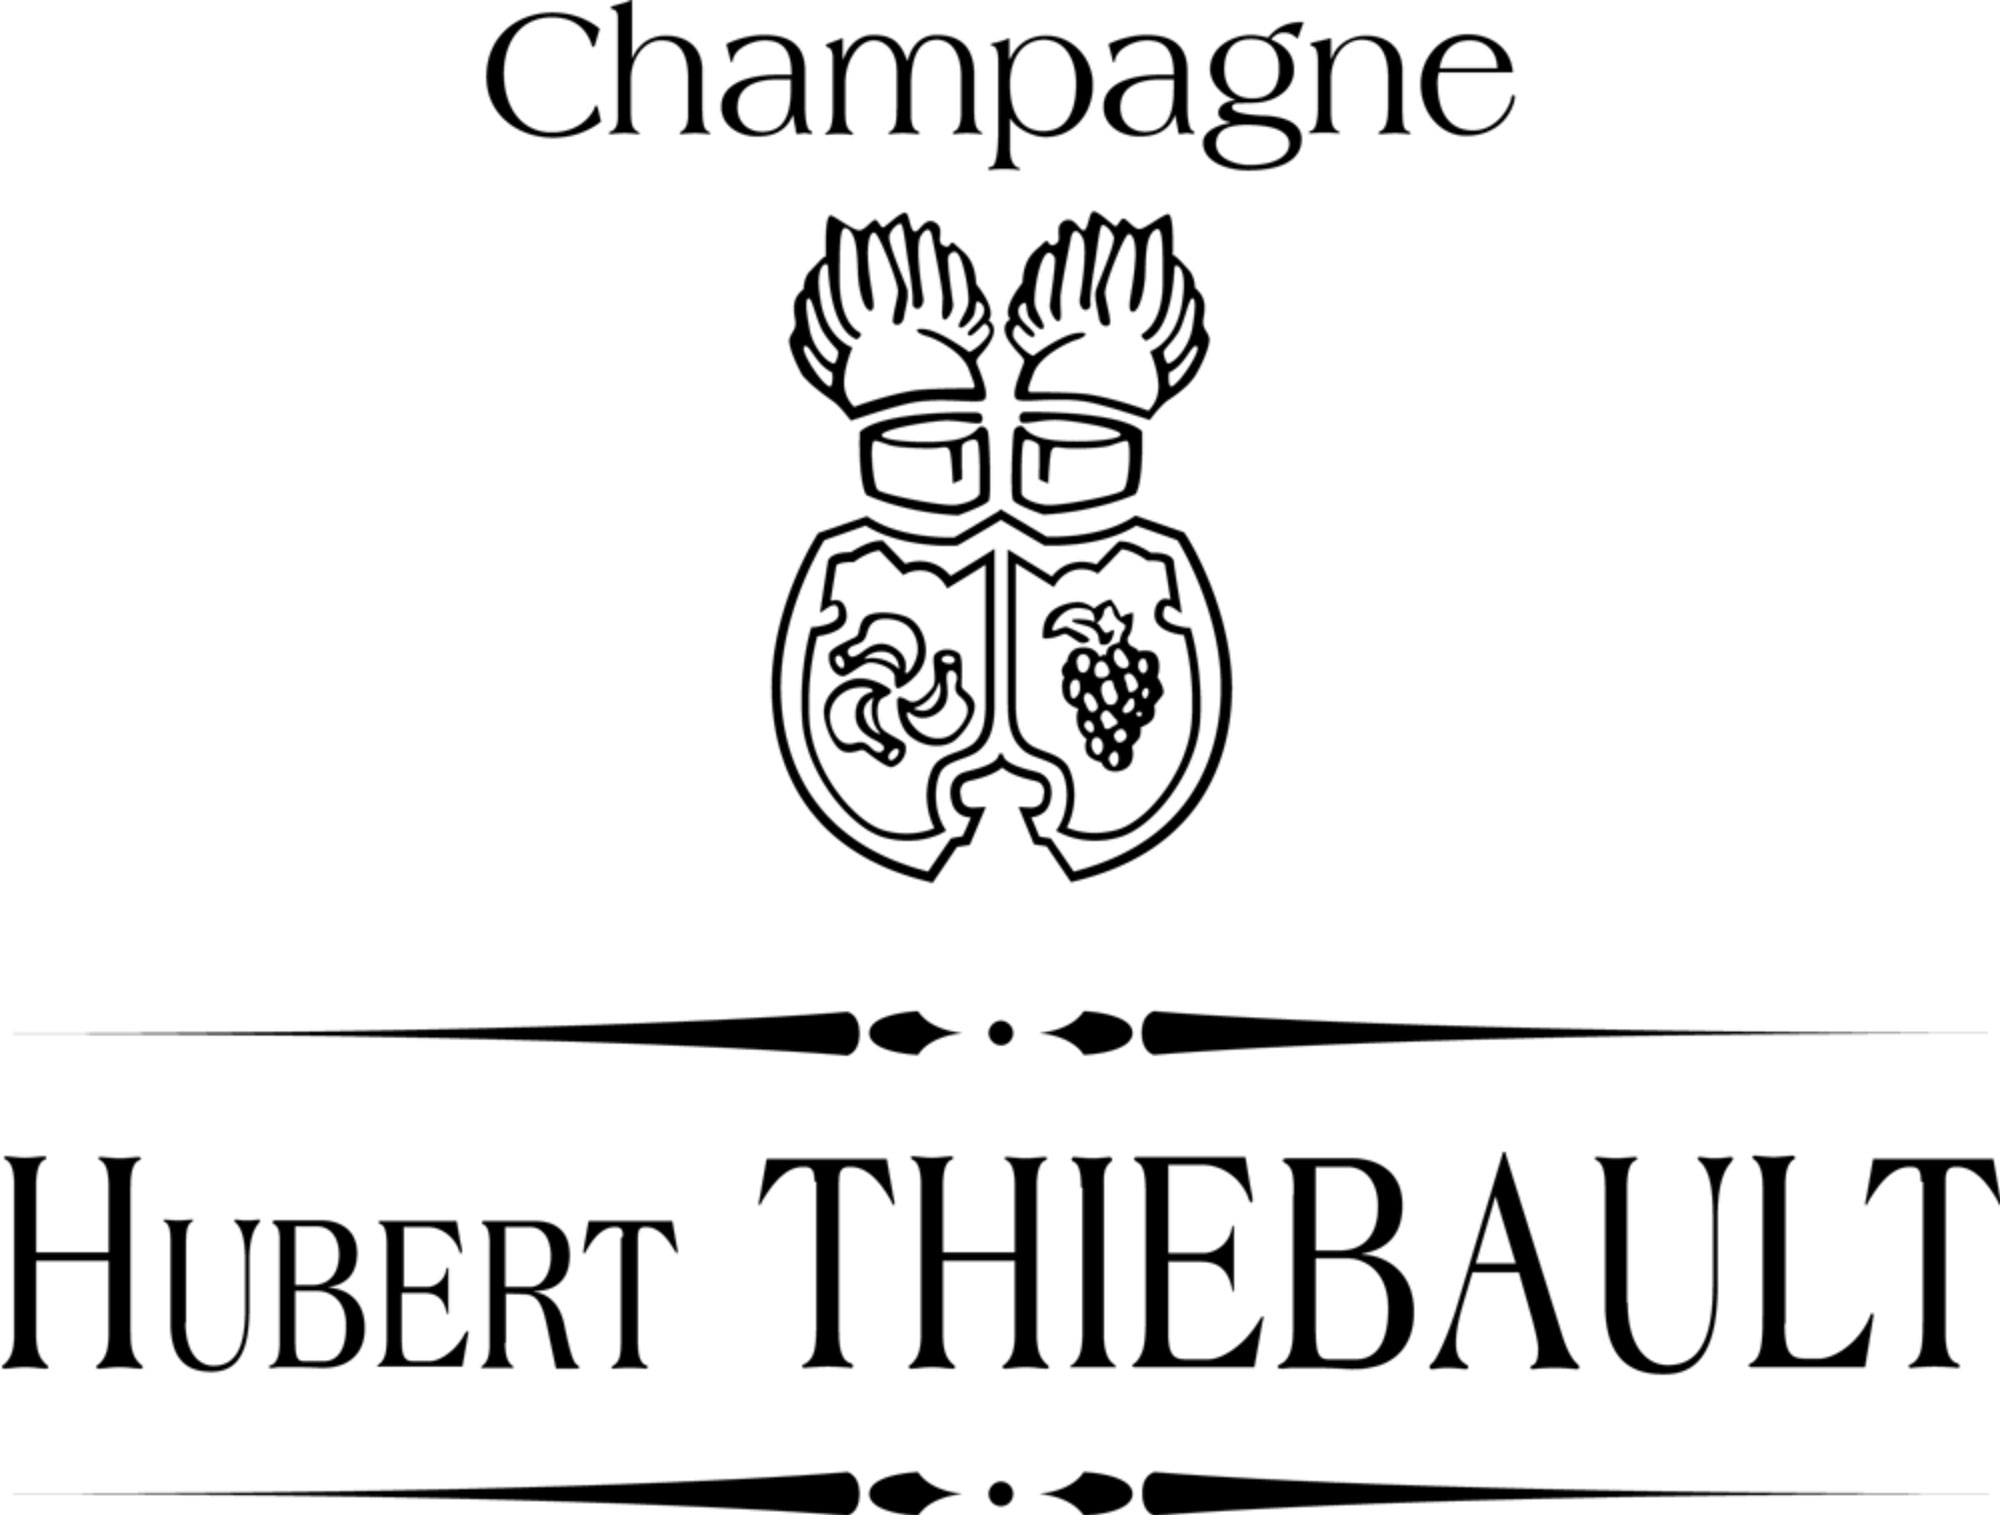 Hubert Thiebault Champagne